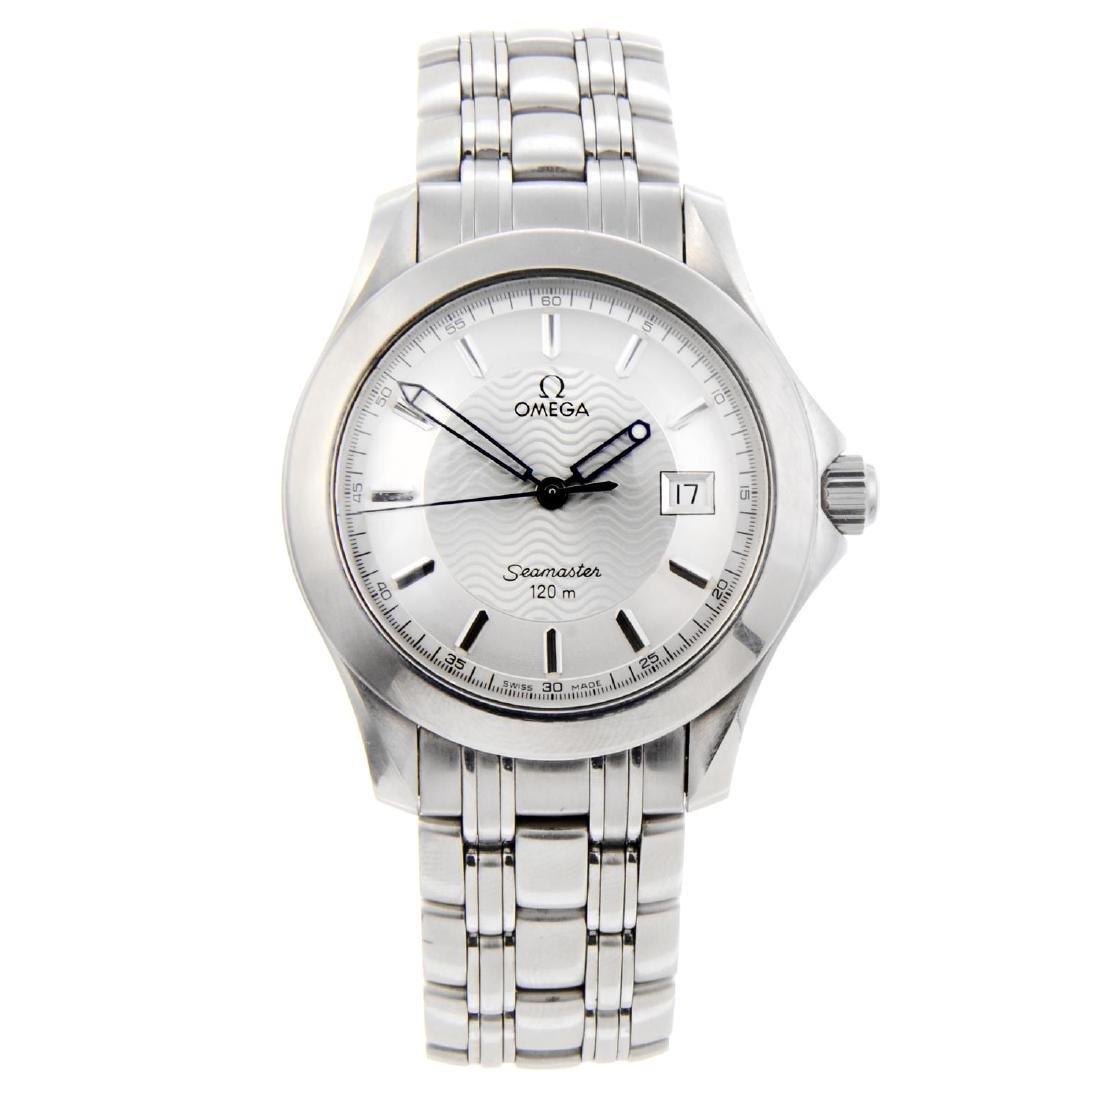 OMEGA - a gentleman's Seamaster 120M bracelet watch.